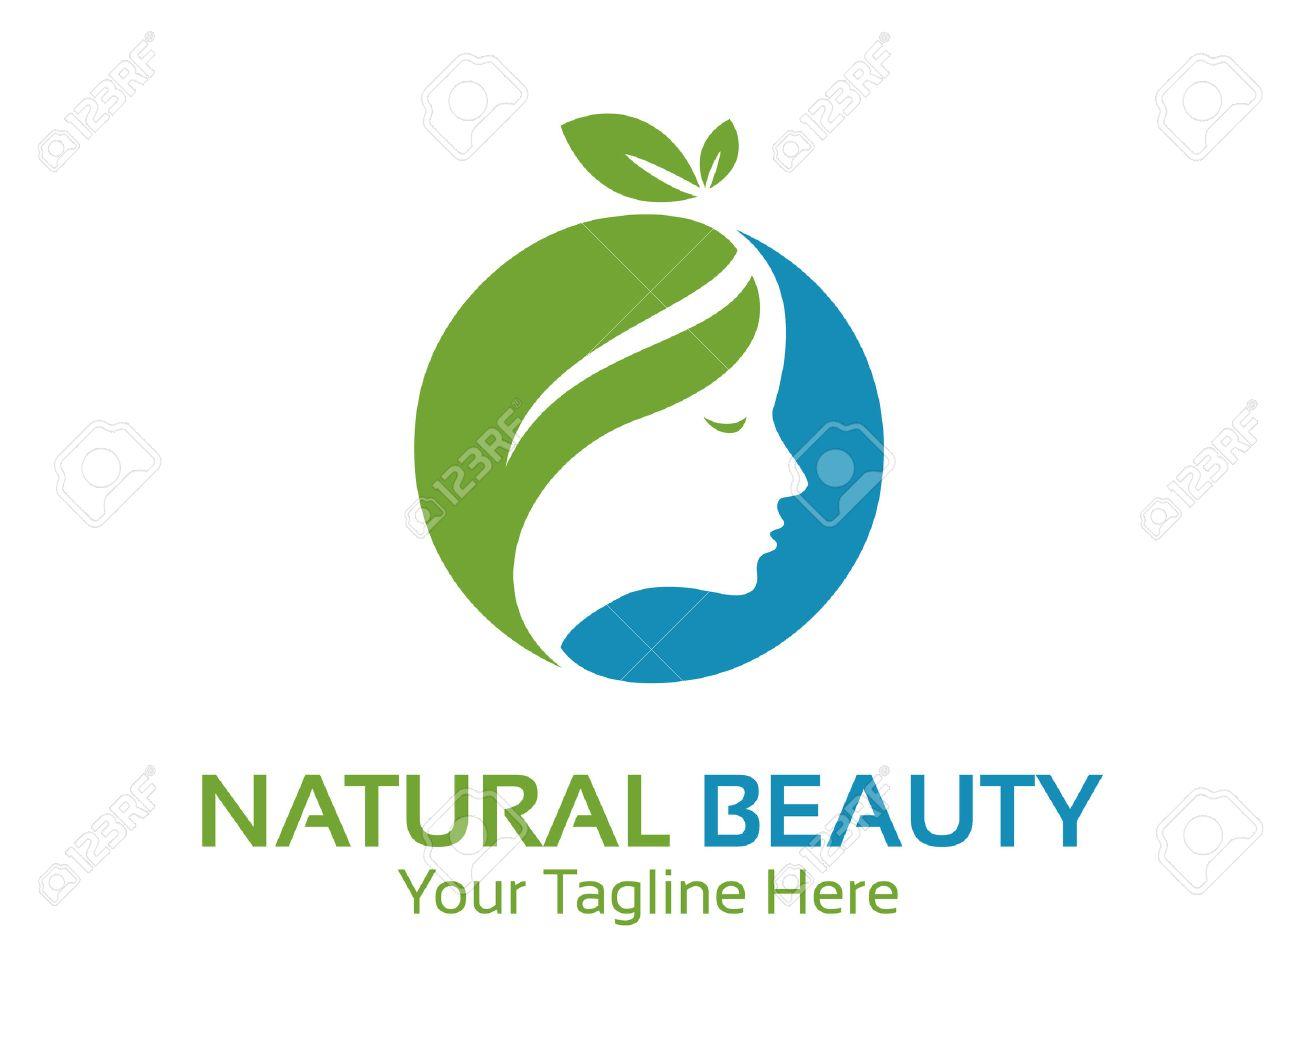 Natural Beauty Logo Design Vector Spa And Treatment Logo Design